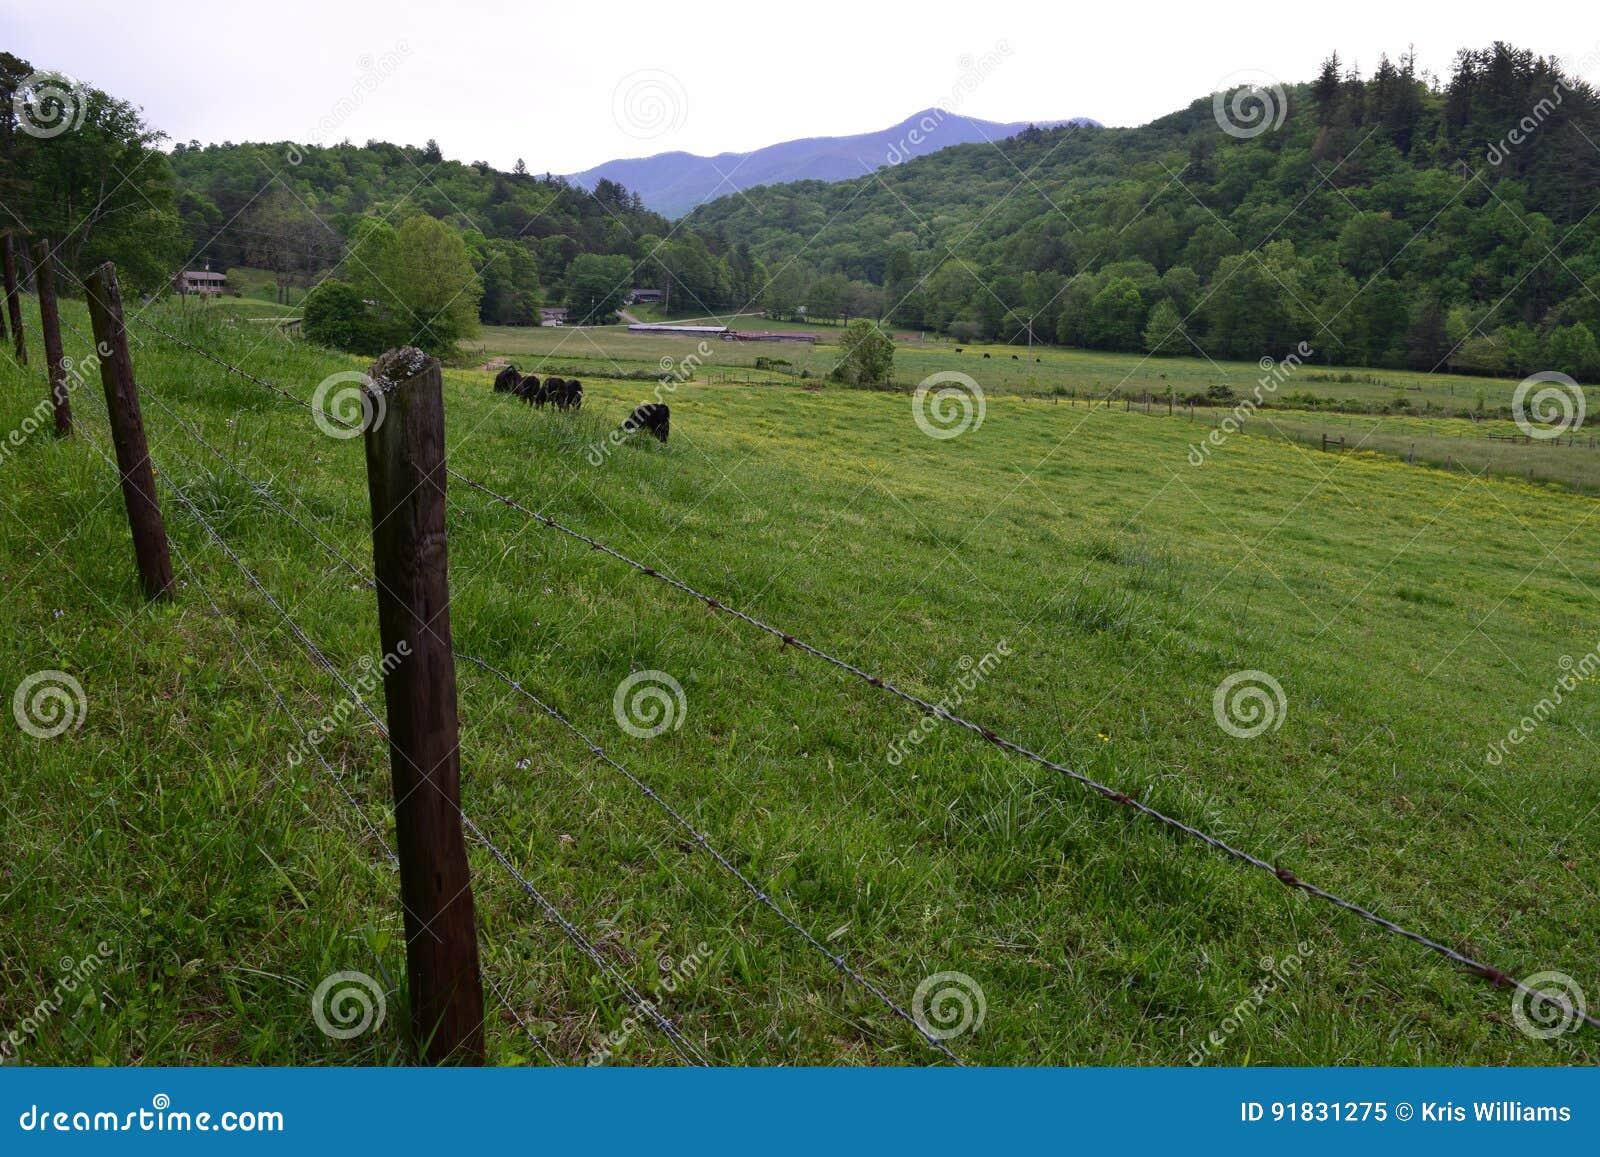 Western NC farm cow pasture